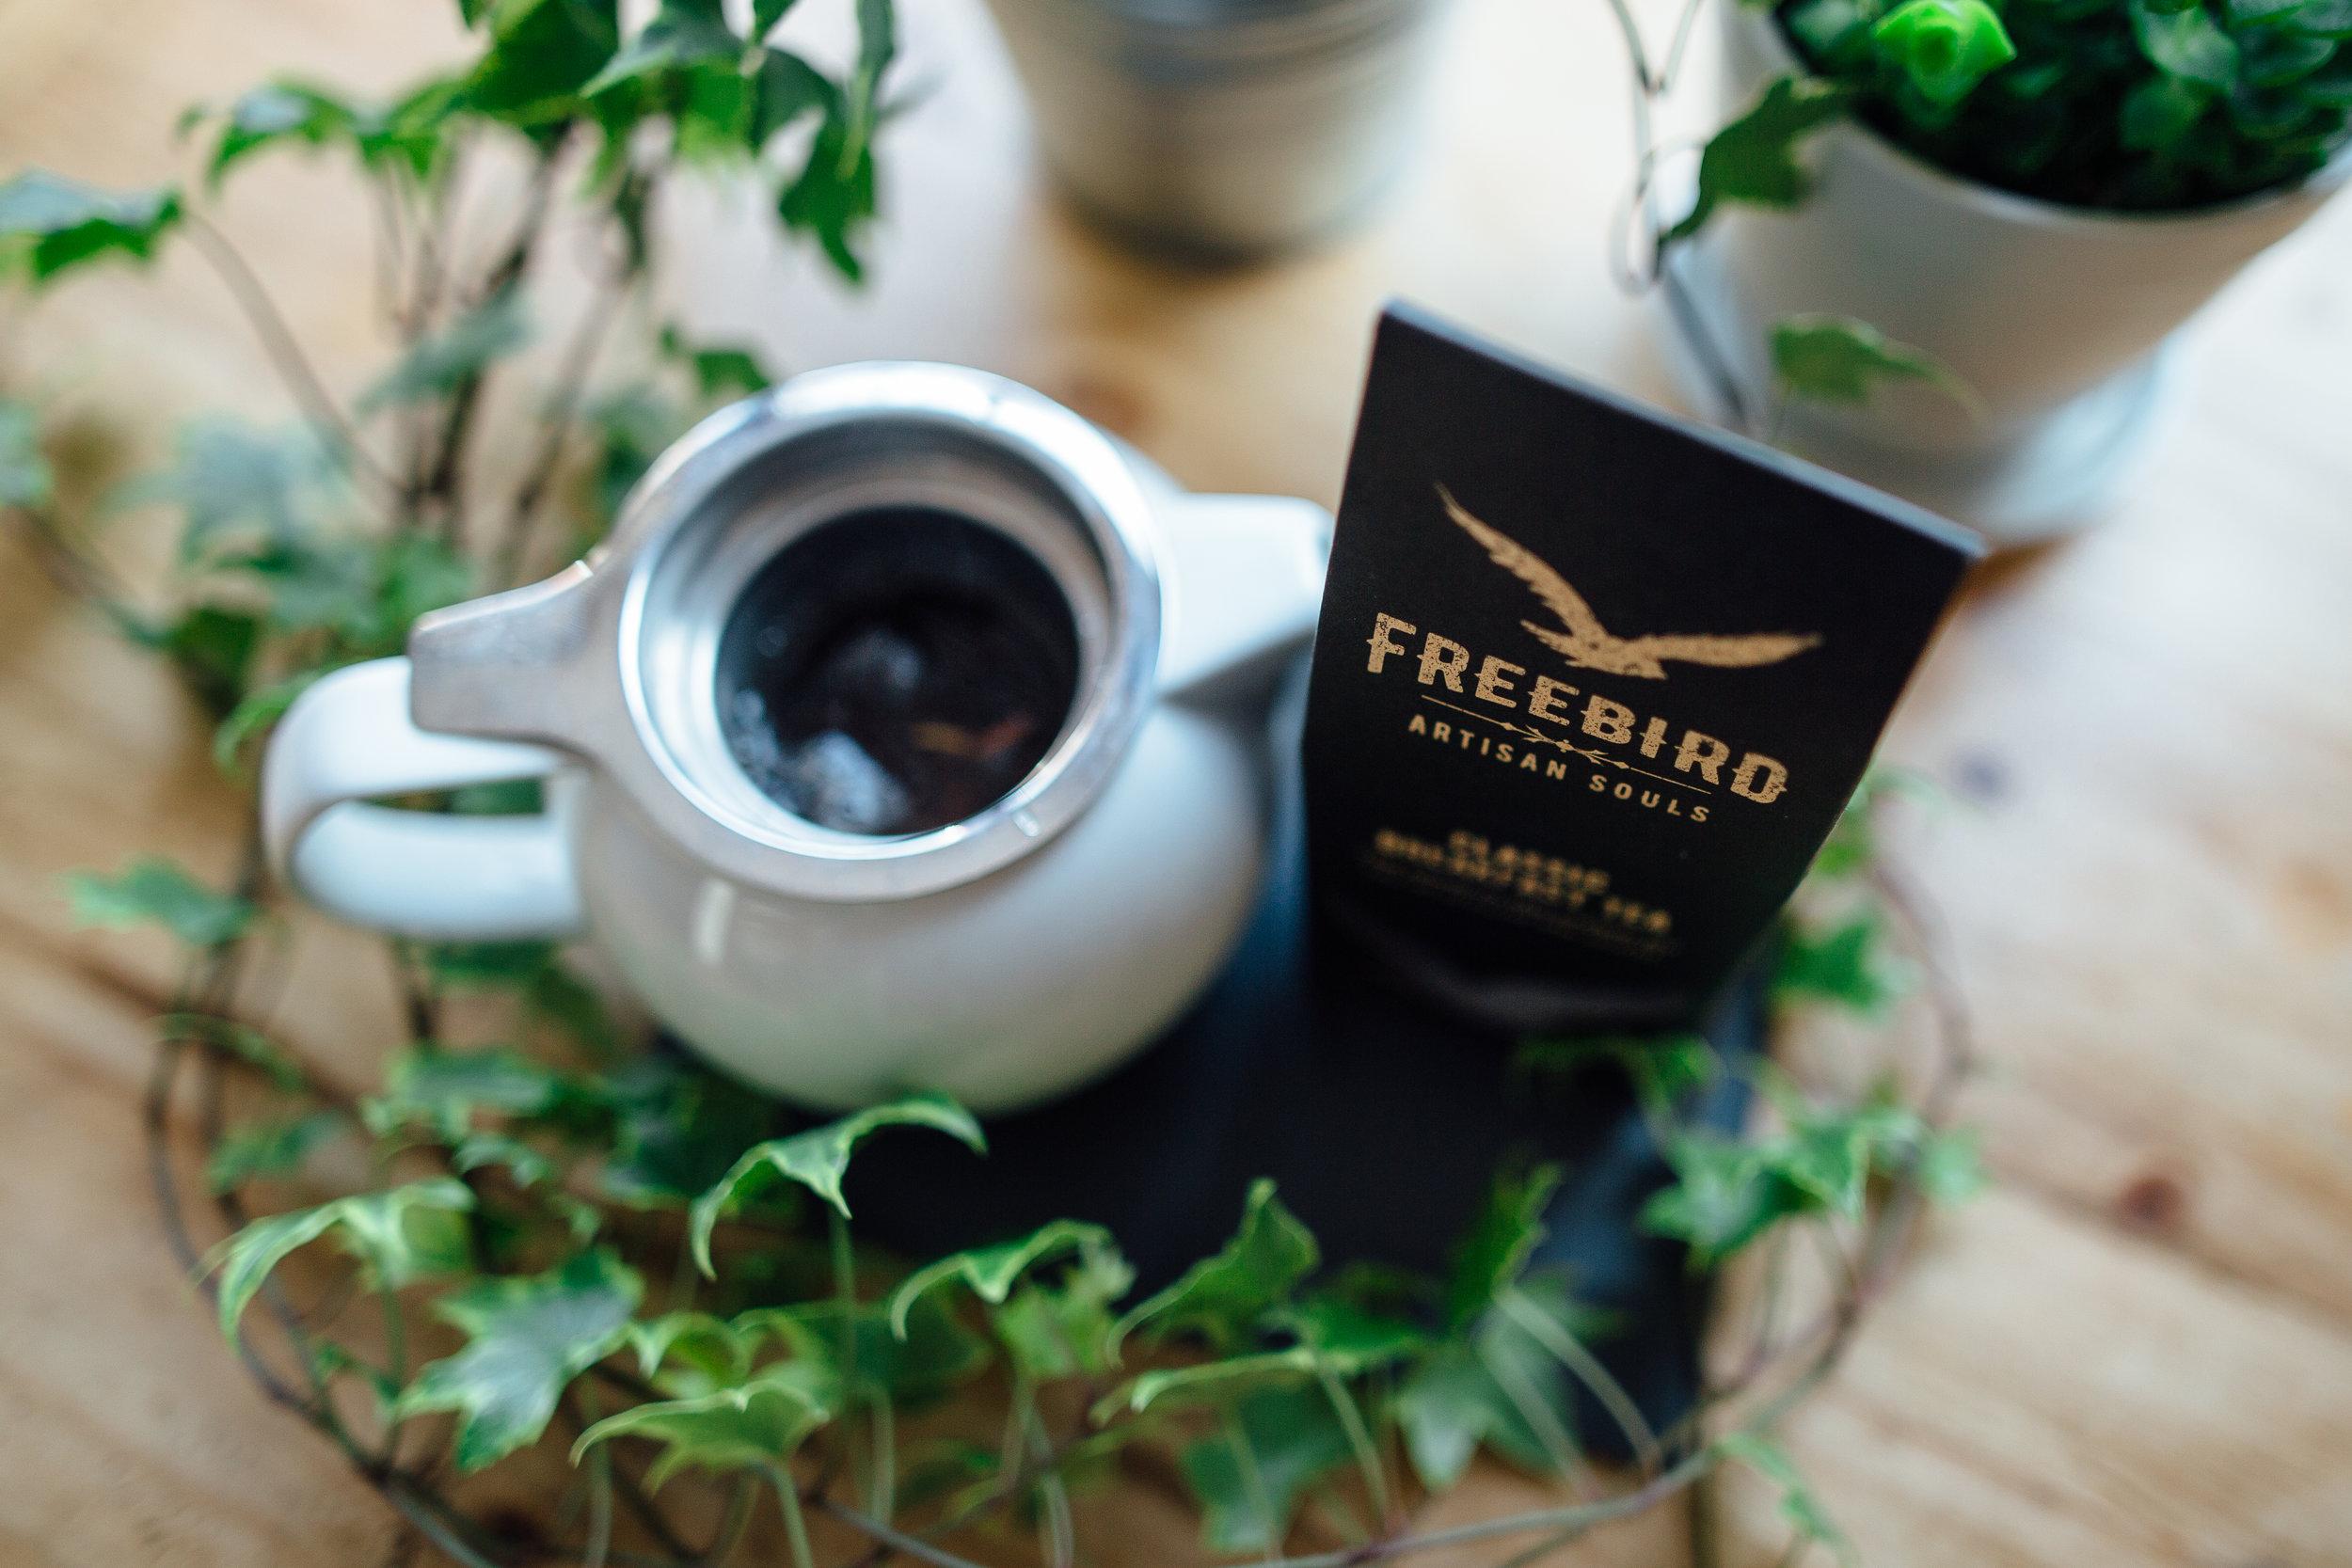 Freebird 4